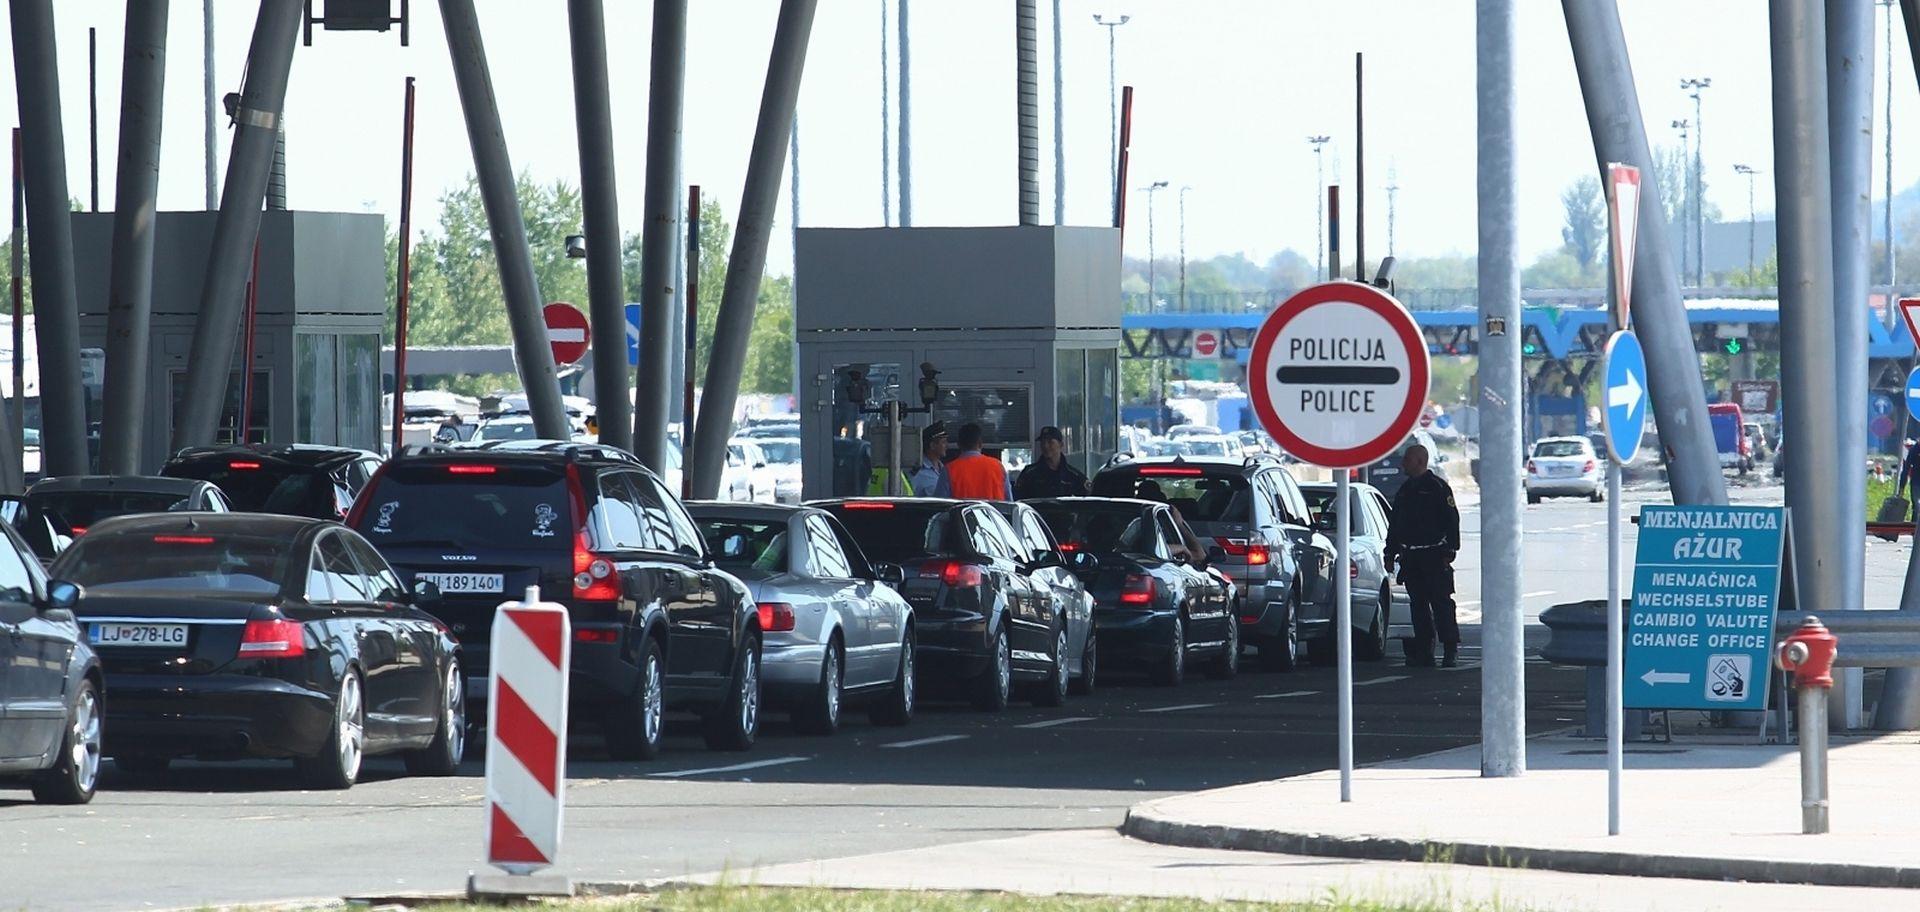 Slovenska policija zaoštrava štrajk na dva prijelaza s Hrvatskom